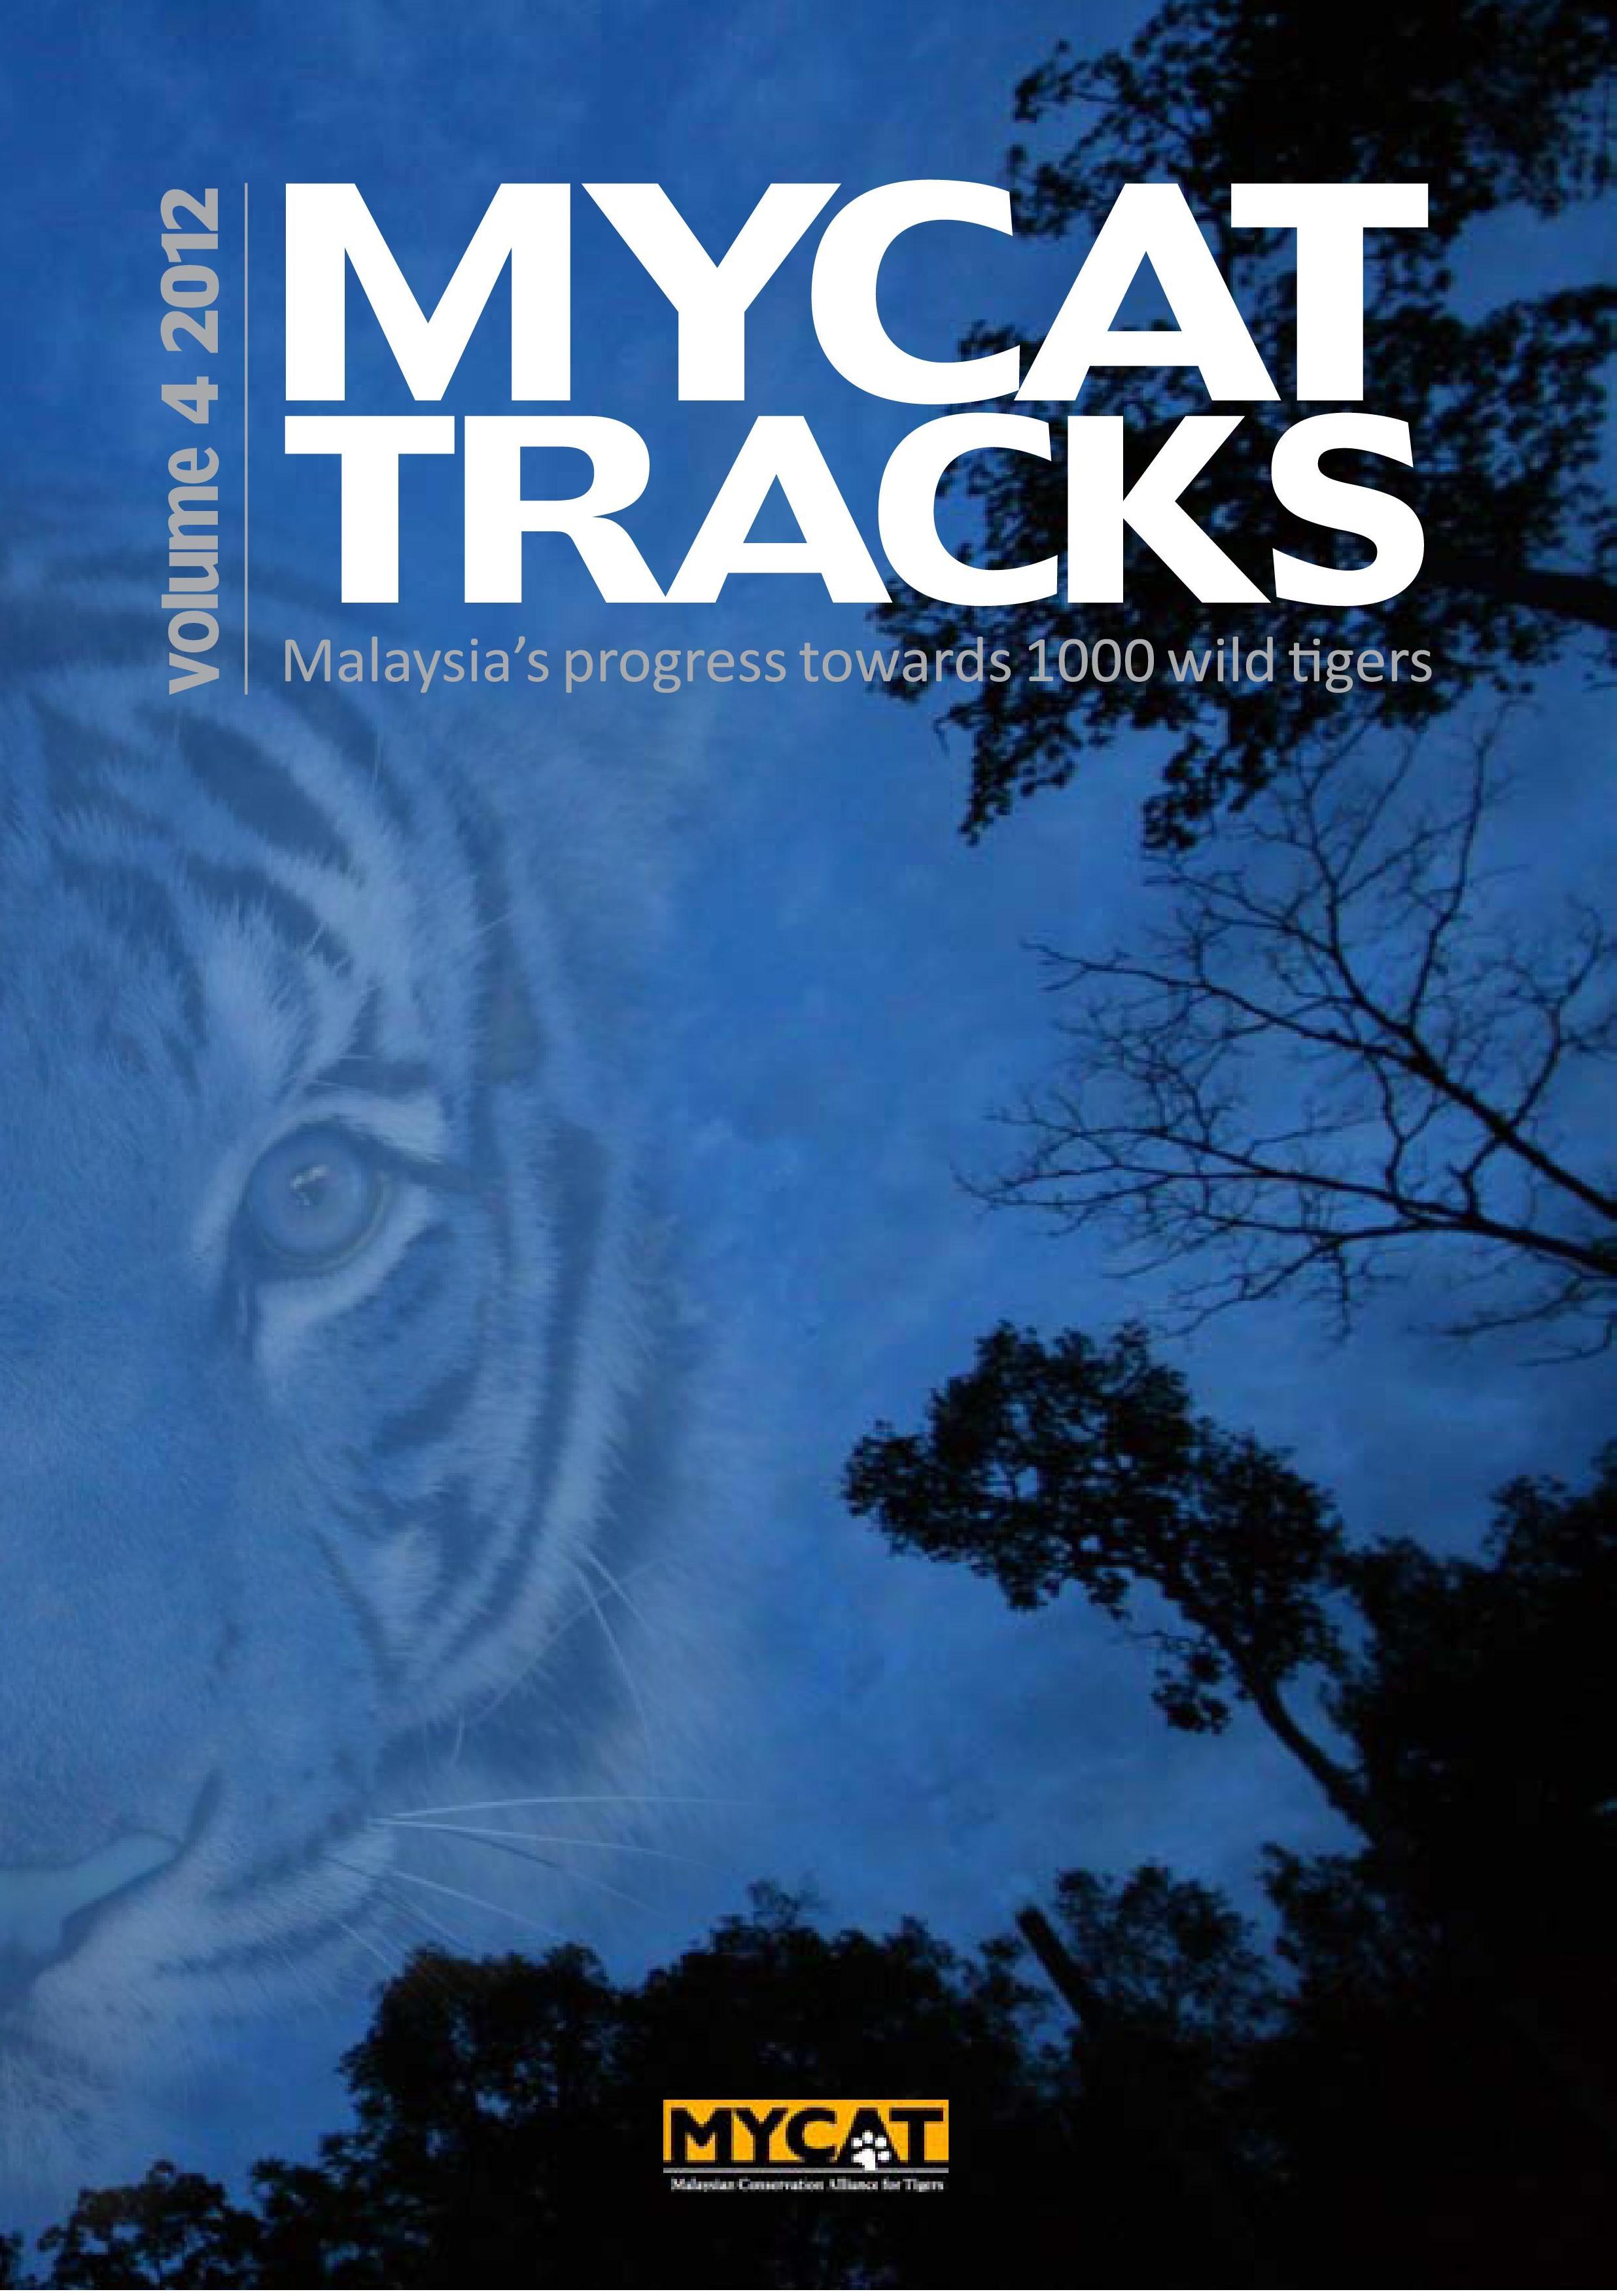 mycat-tracks-2010-2011